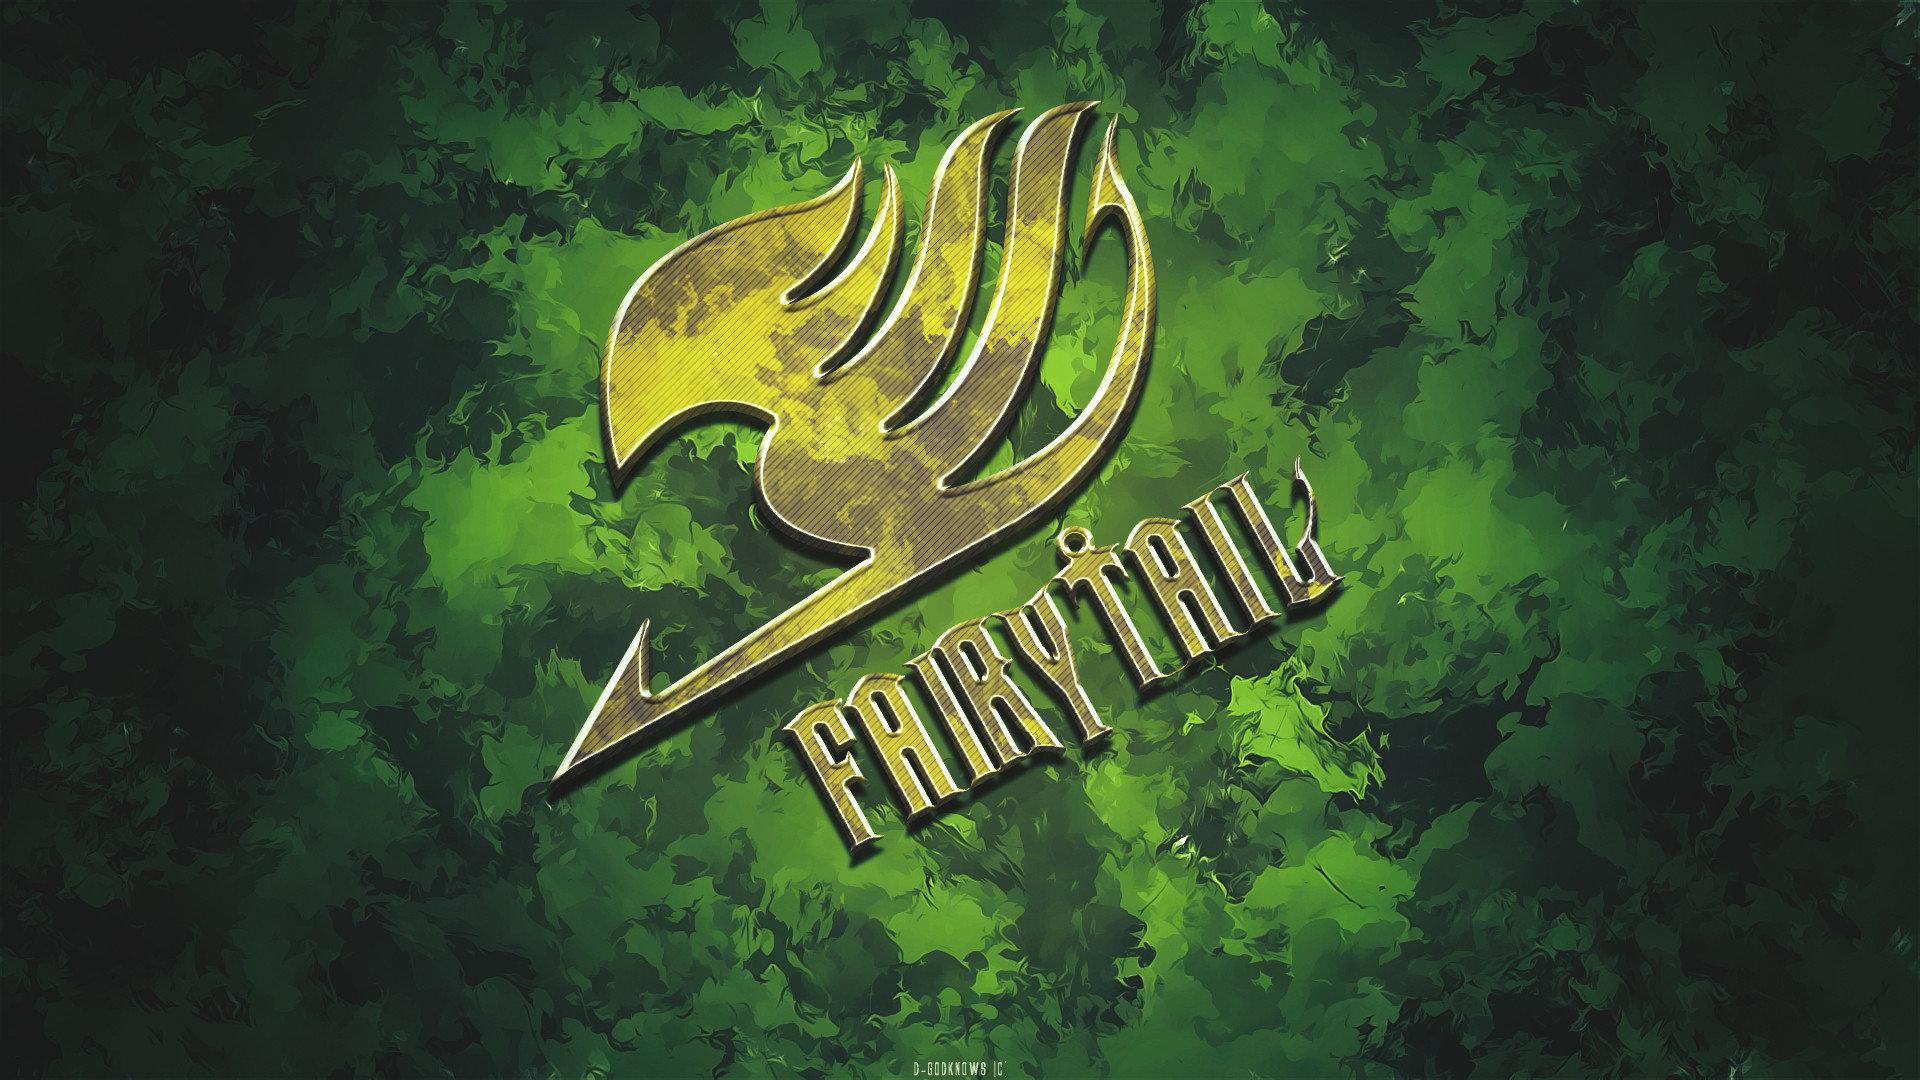 Fairy Tail Wallpapers Full HD 1080p Desktop